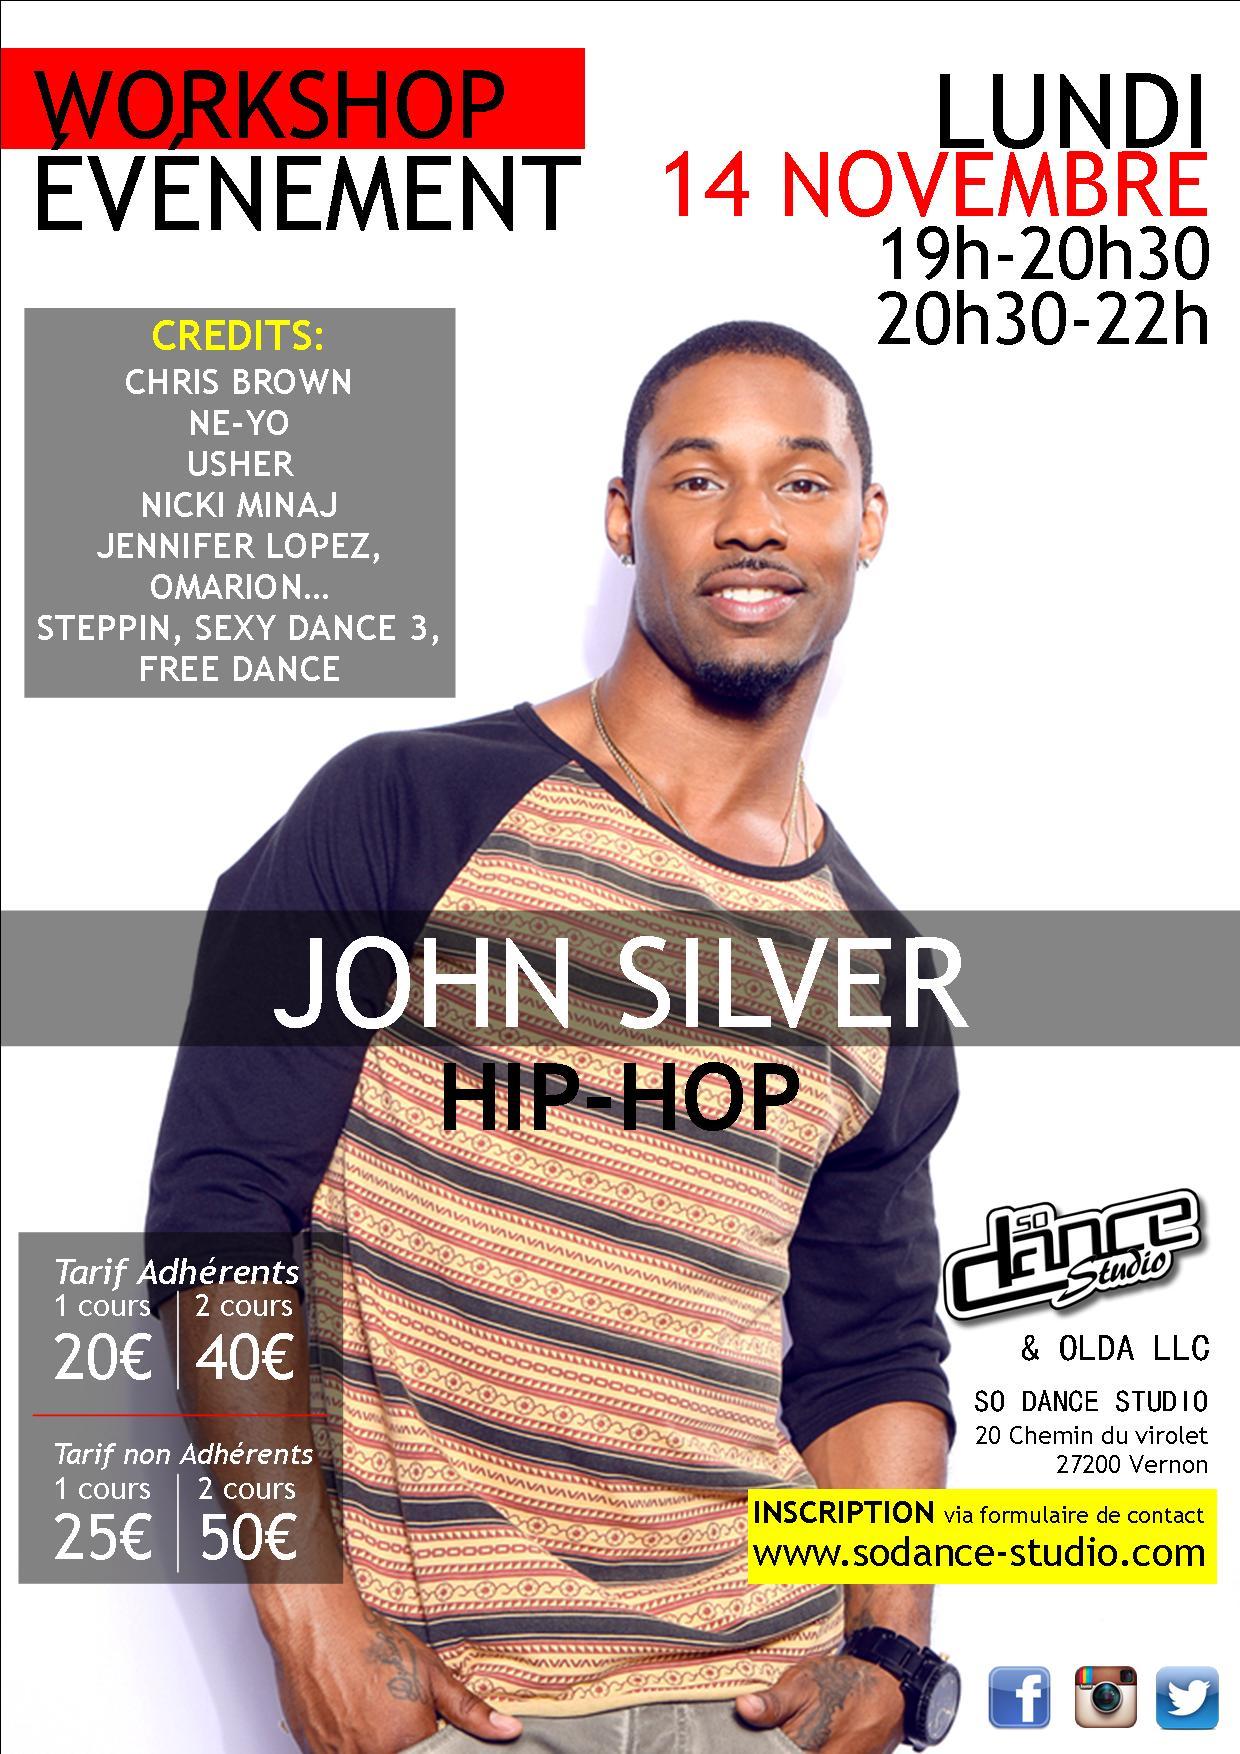 WORKSHOP - JOHN SILVER - 14 NOVEMBRE